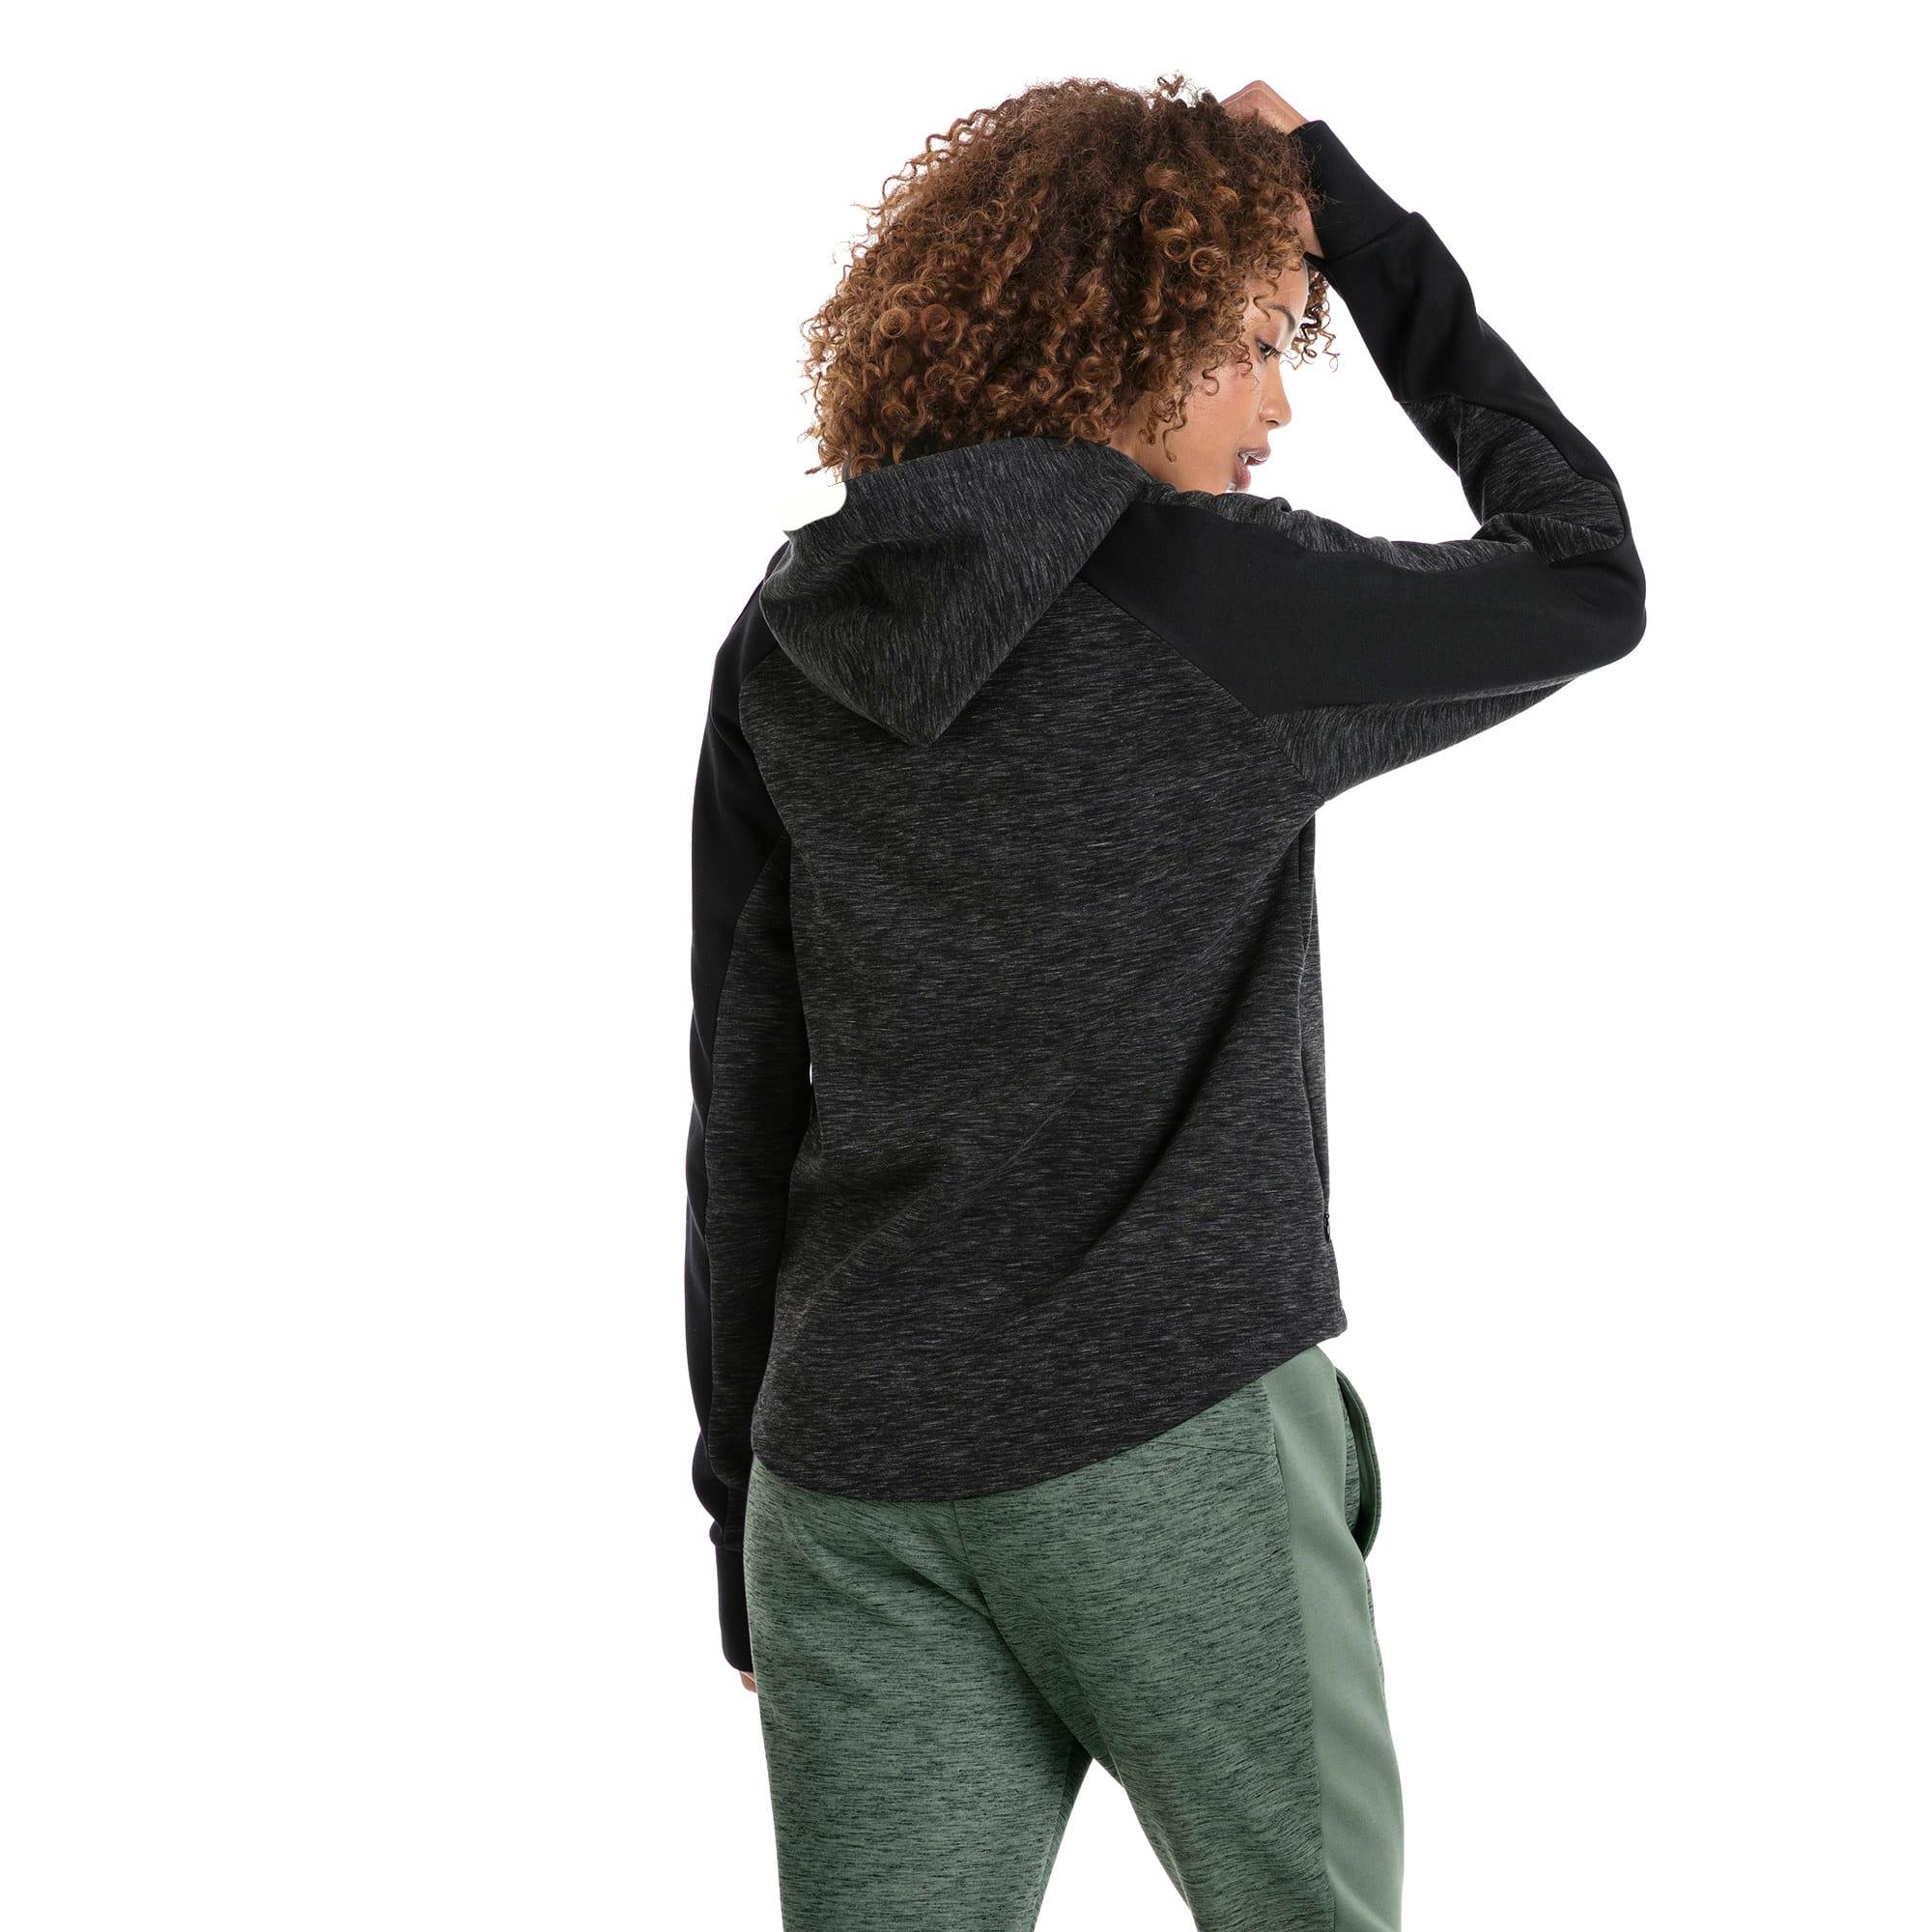 Thumbnail 3 of Evostripe hoodie met rits voor dames, Cotton Black-heather, medium